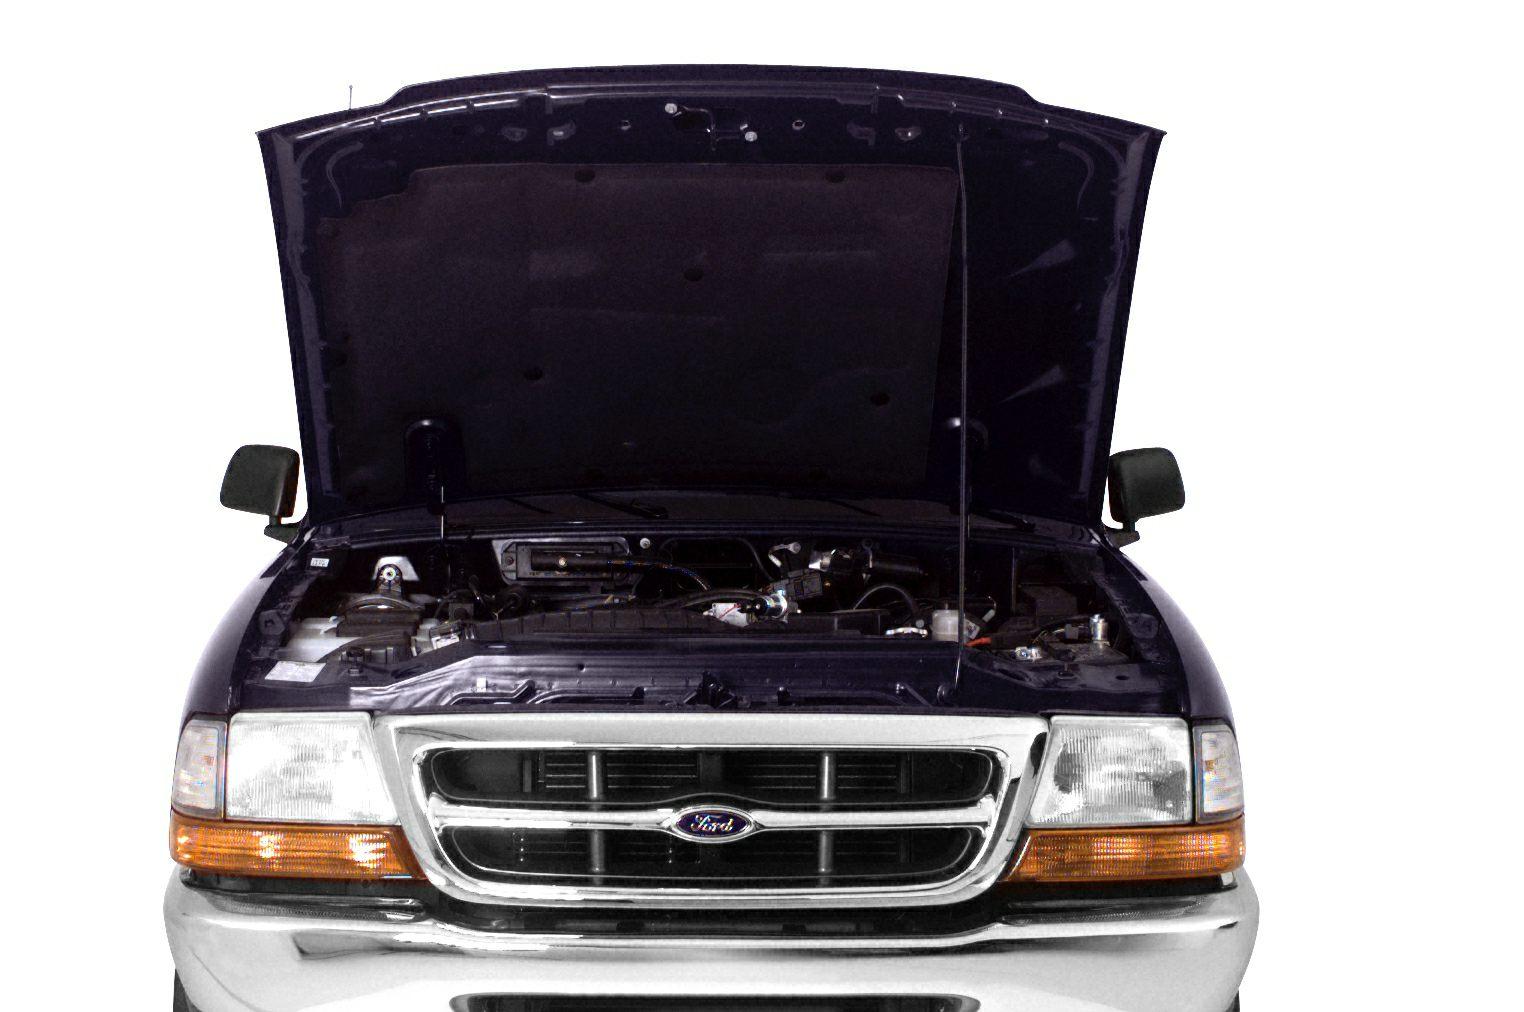 2000 Ford Ranger Exterior Photo